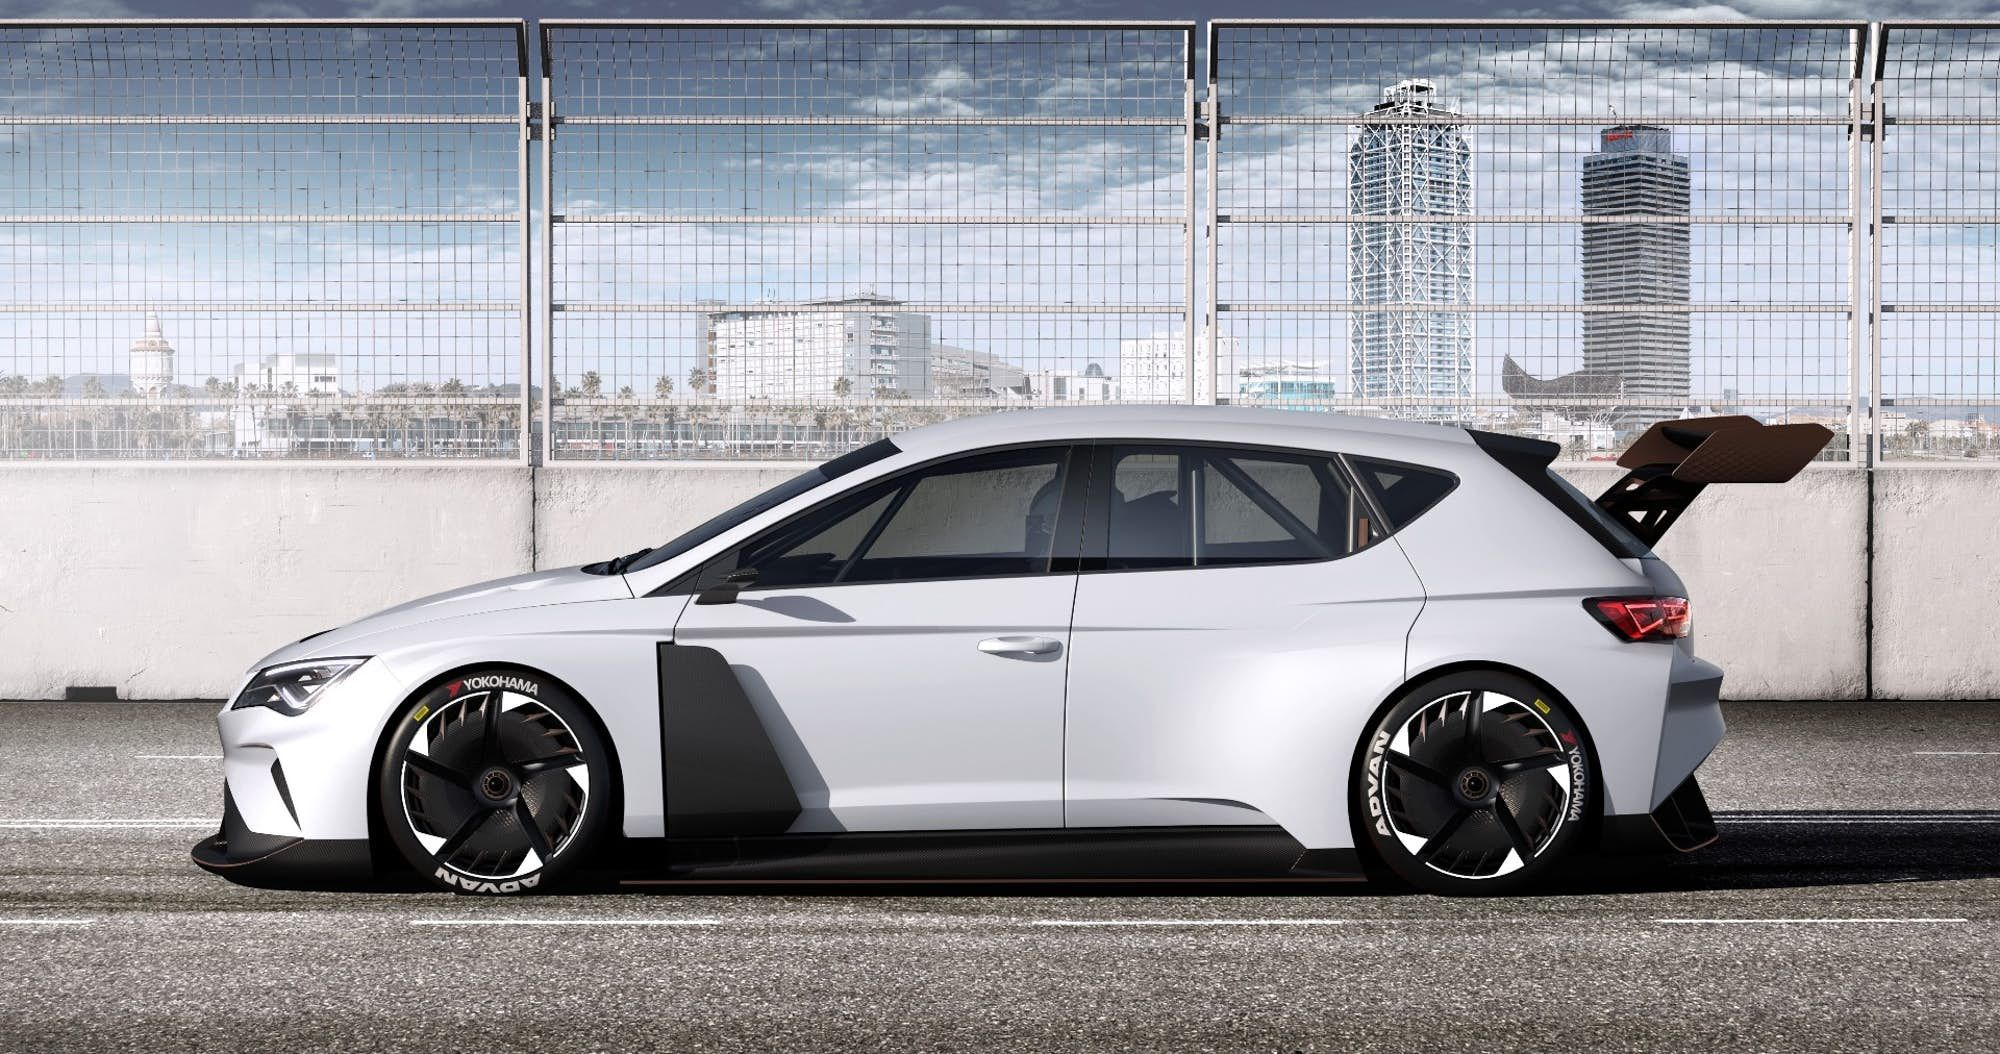 Seat Kicks Off Its Cupra Brand With 680 Hp E Racer Electric Touring Car Seat Cupra Car In The World Car